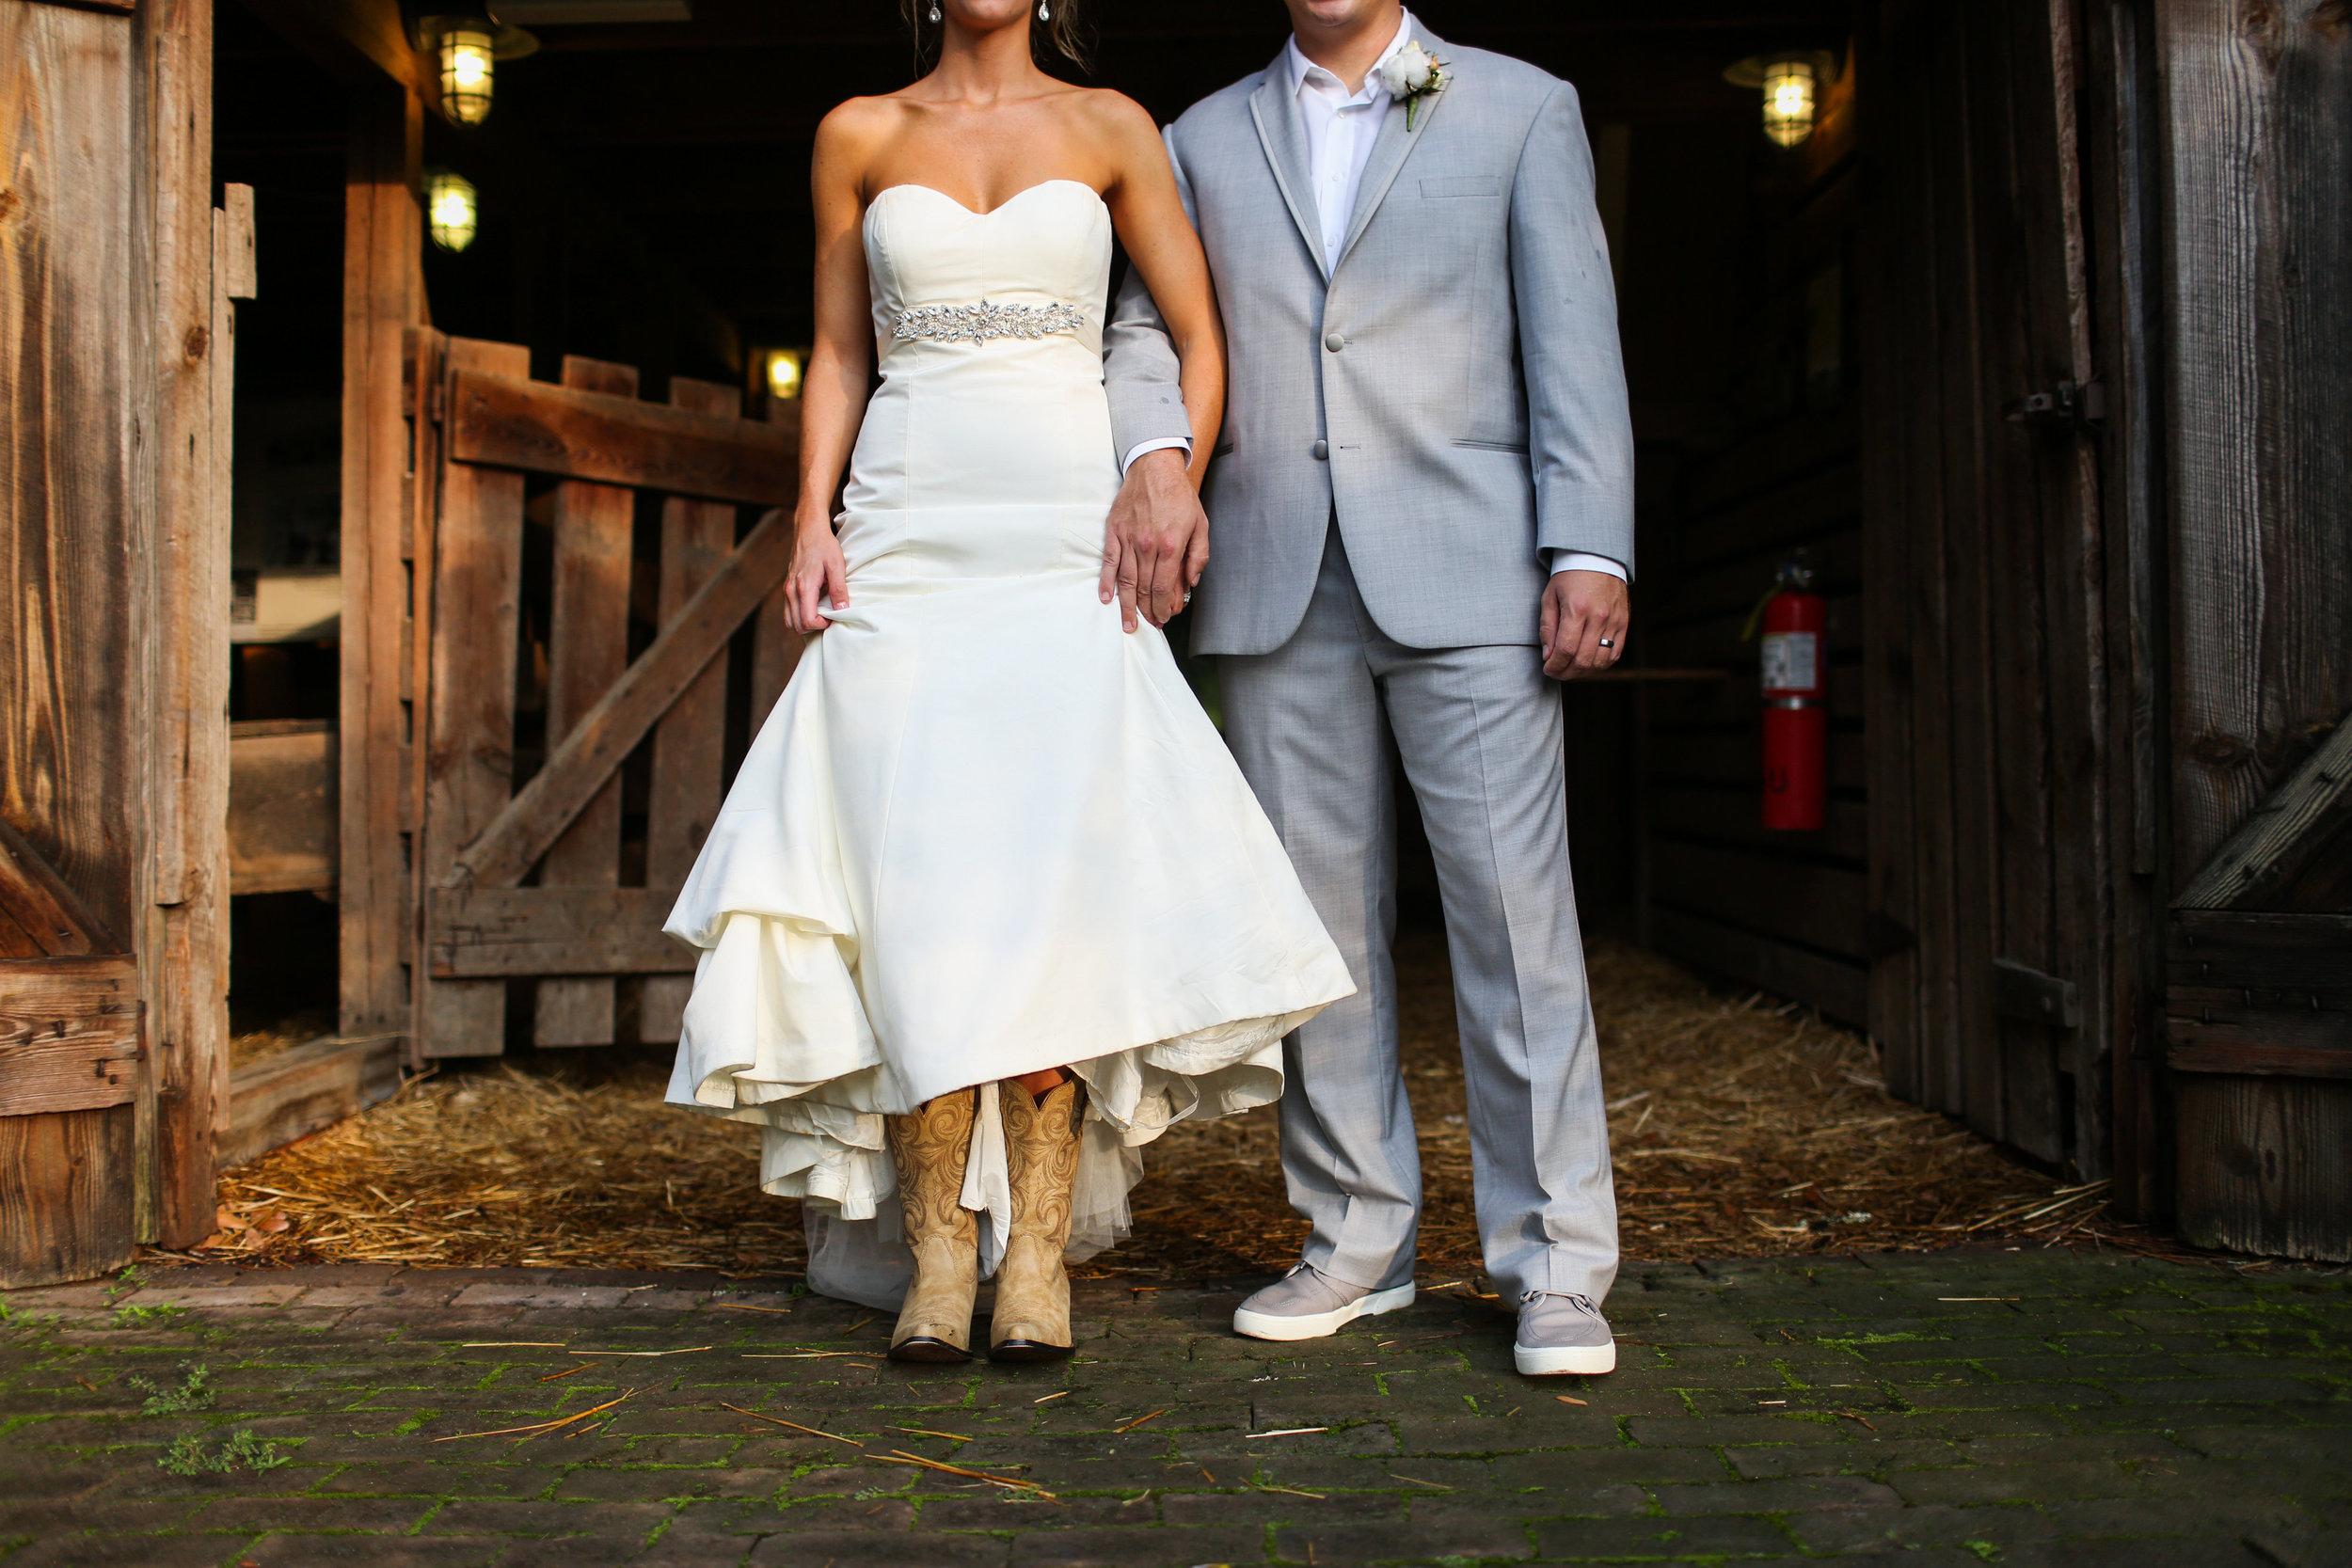 finnegan-photography-ivory-and-beau-bridal-boutique-nicole-miller-dakota-jaclyn-jordan-anne-veil-savannah-bridal-boutique-savannah-wedding-dresses-savannah-weddings-statesboro-wedding-barn-wedding-savannah-bridal-georgia-bridal-boutique-17.jpg